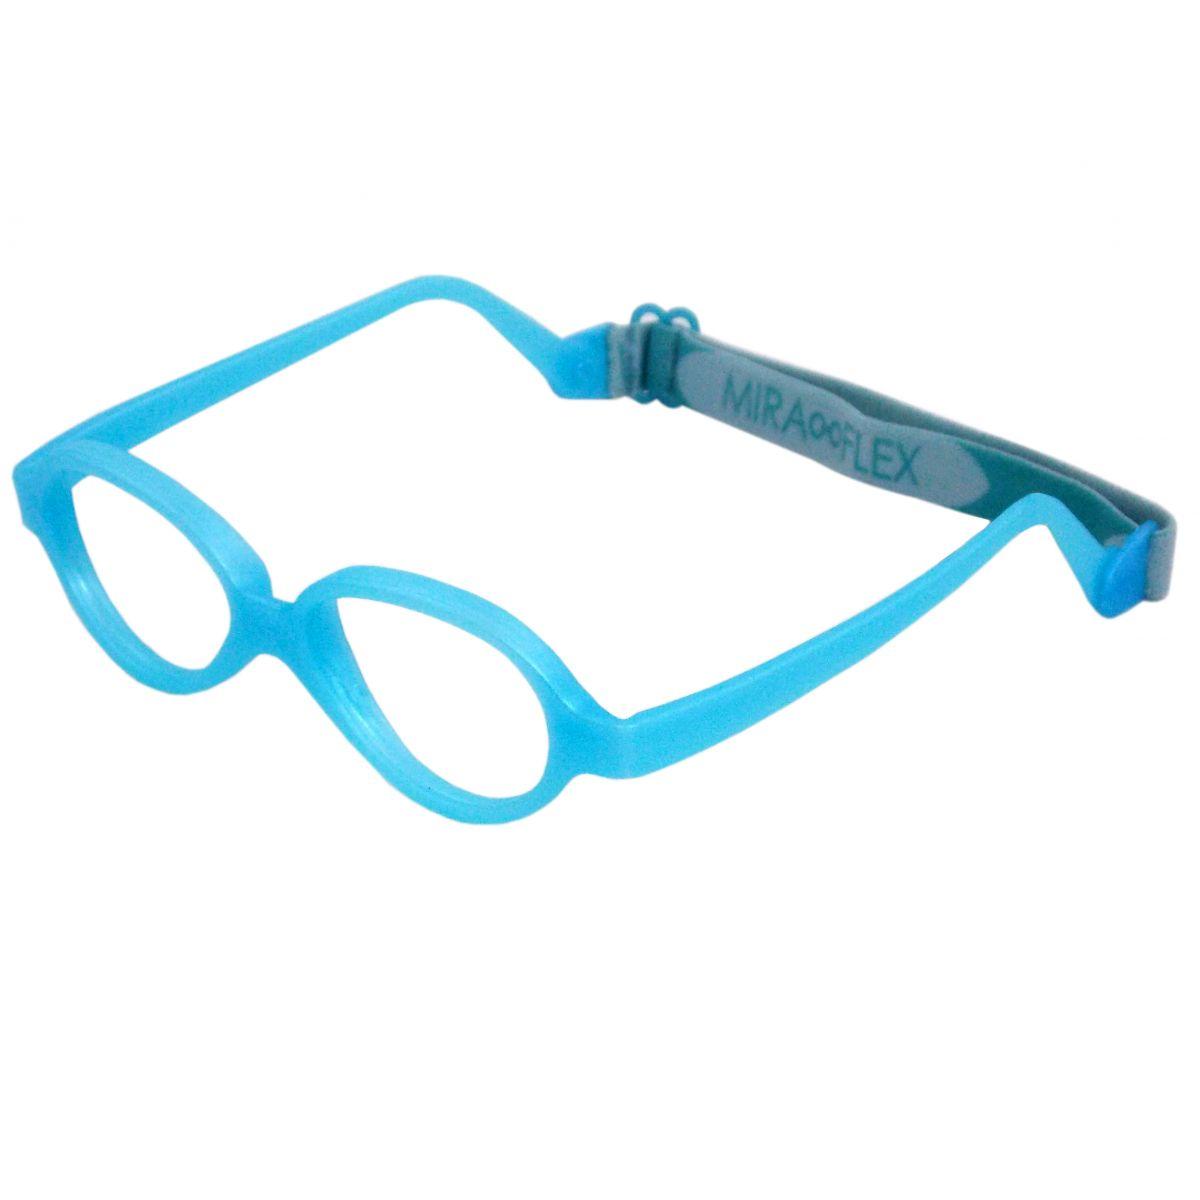 Óculos De Grau Infantil Miraflex Silicone 1 a 3 Anos Baby One Tam.37. Image  description Image description ... 0ad141d057